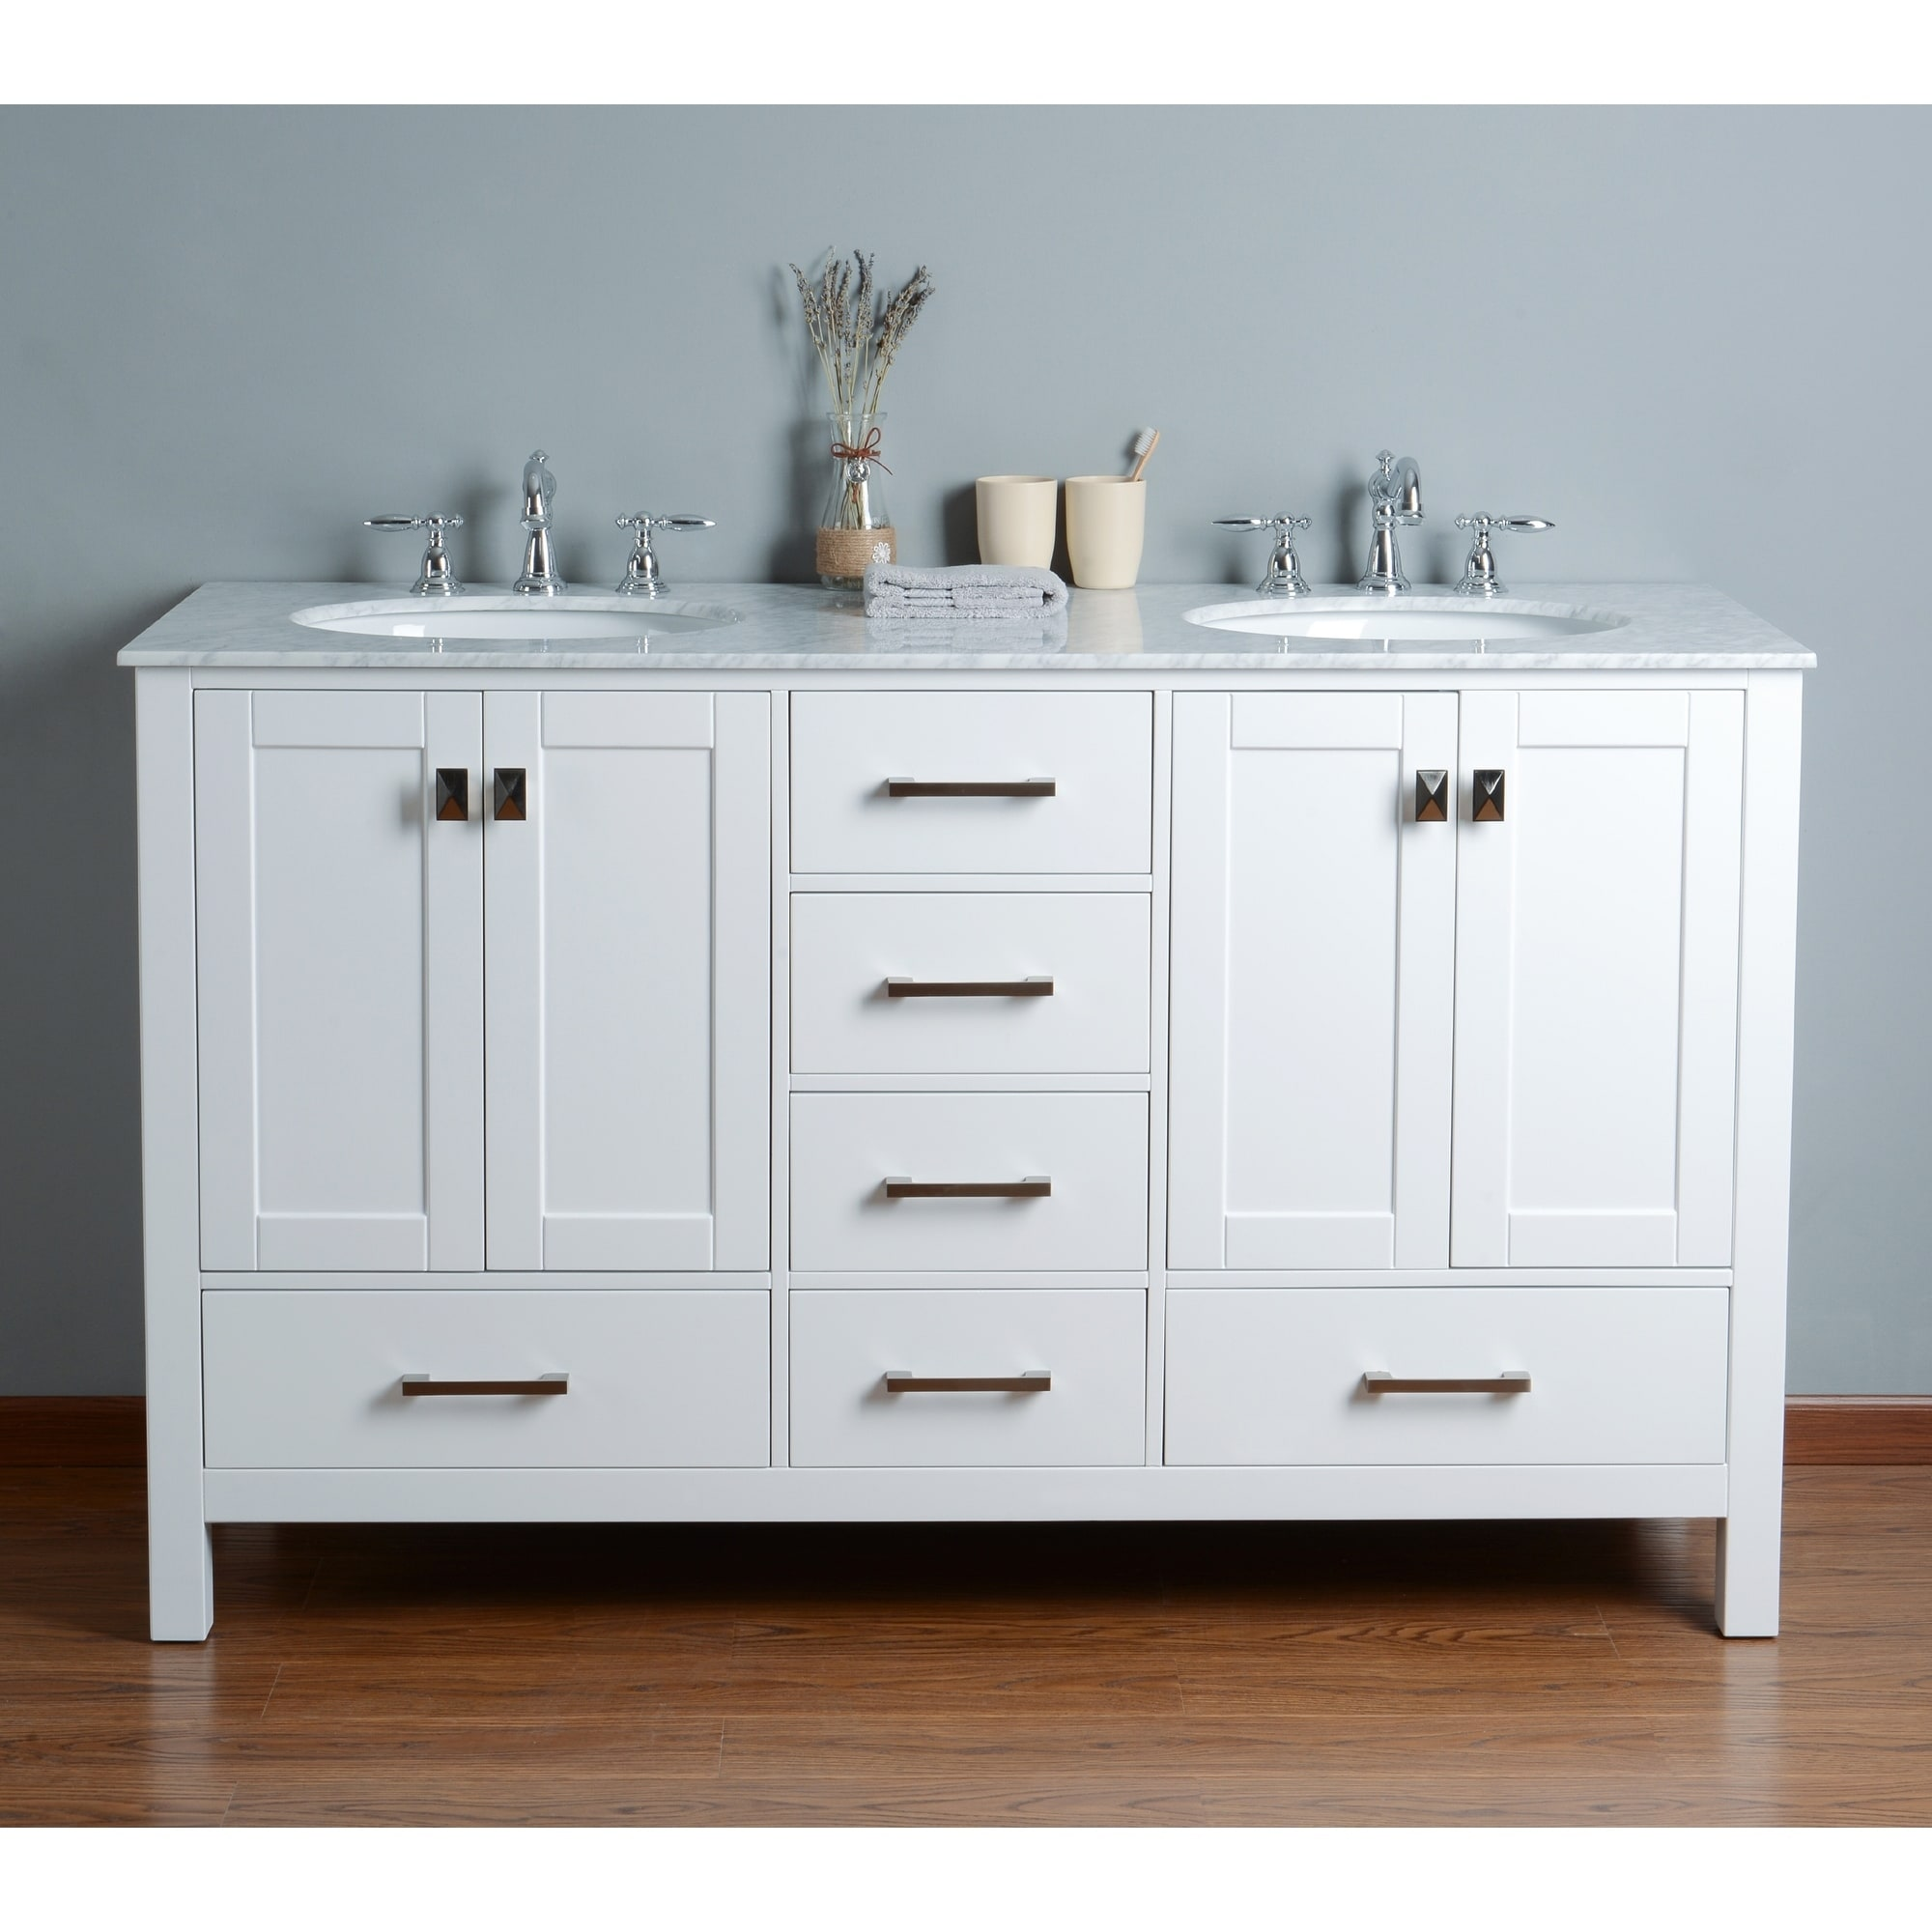 48 Inch Bath Vanity, Shop Stufurhome 60 Inch Malibu Pure White Double Sink Bathroom Vanity Overstock 9276264